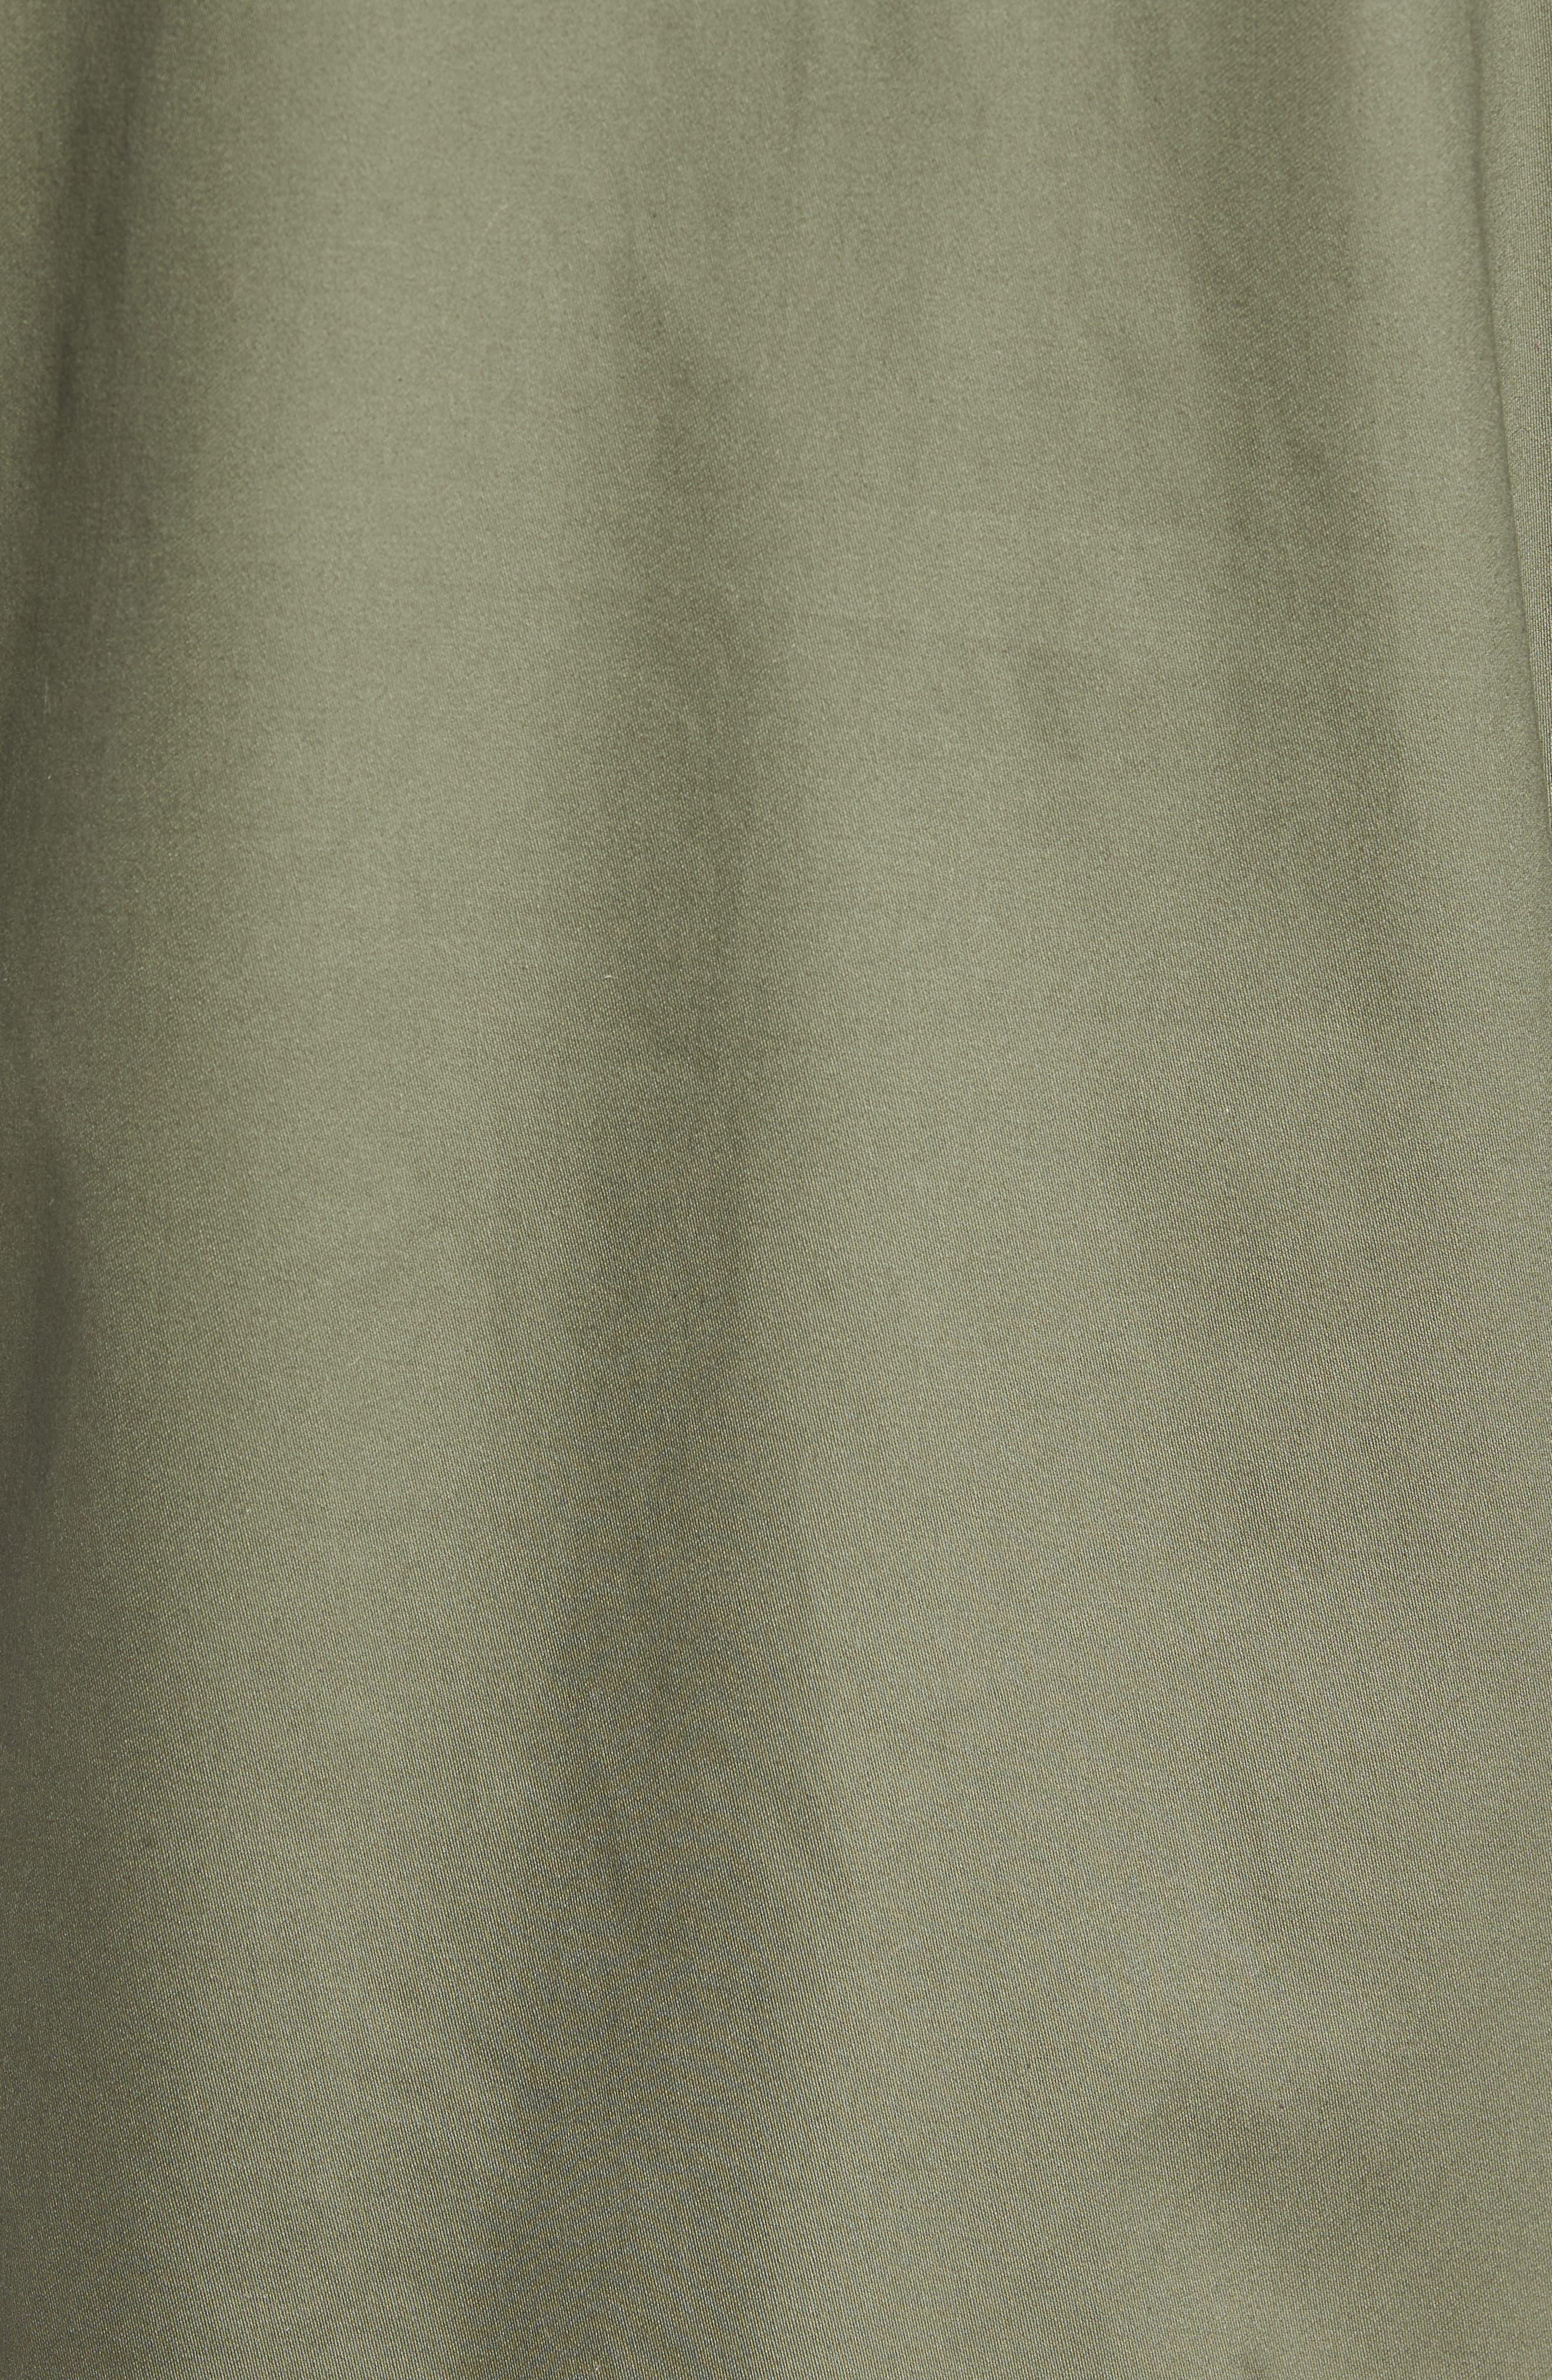 Heller II Jacket,                             Alternate thumbnail 5, color,                             Army